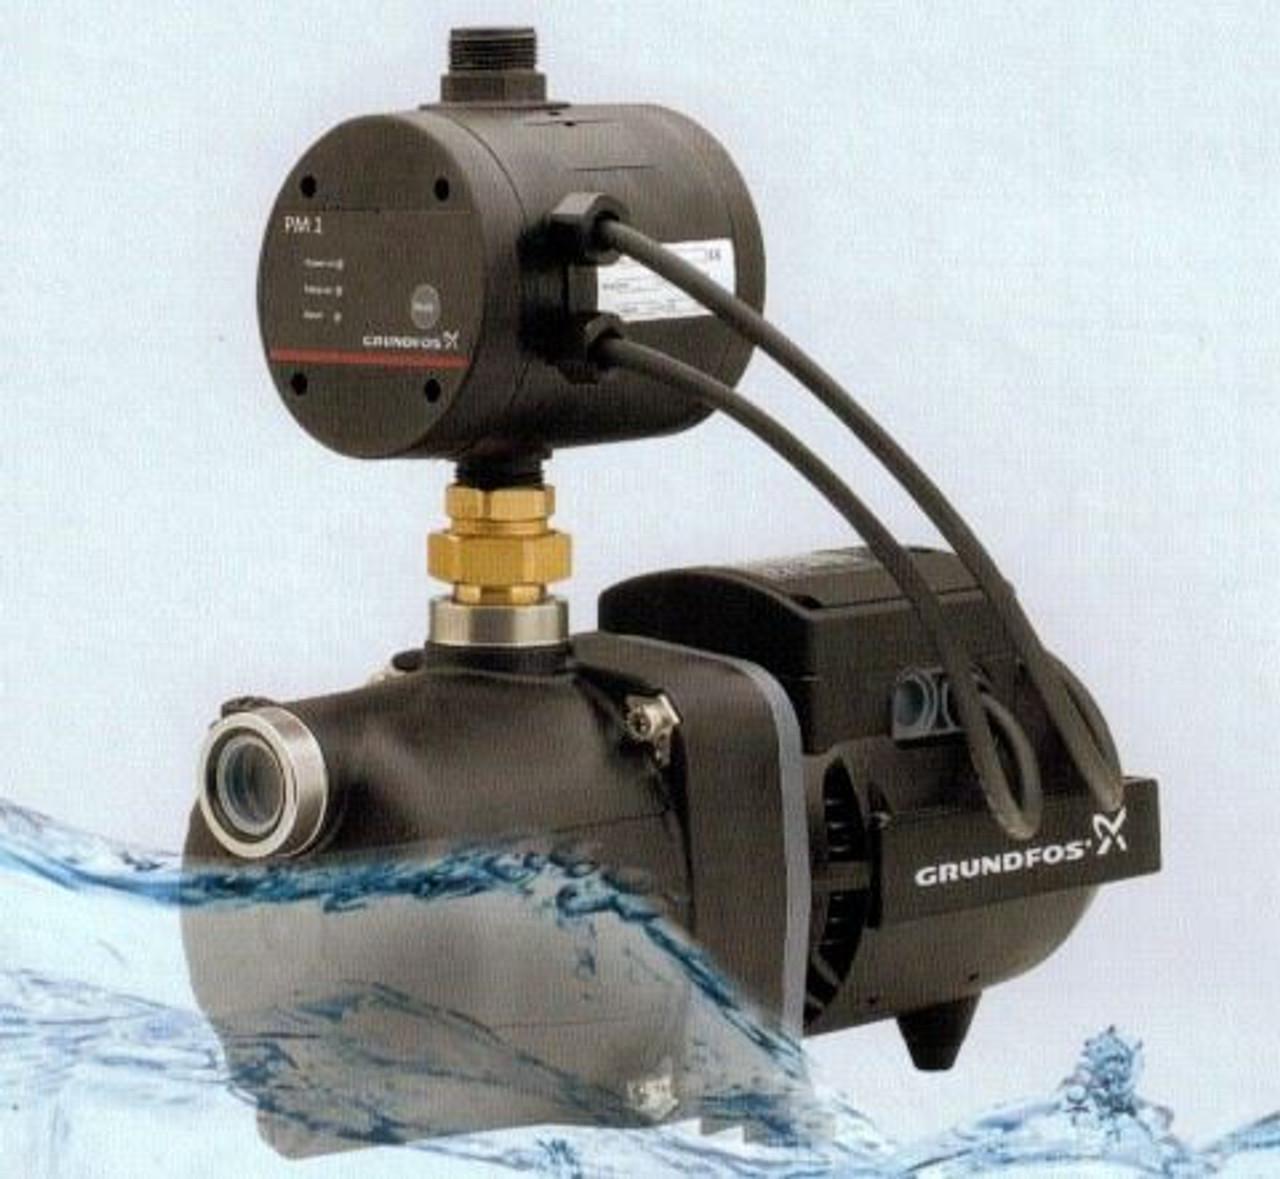 Grundfos JPC 3 Pump with PM1 Control 0.6kW